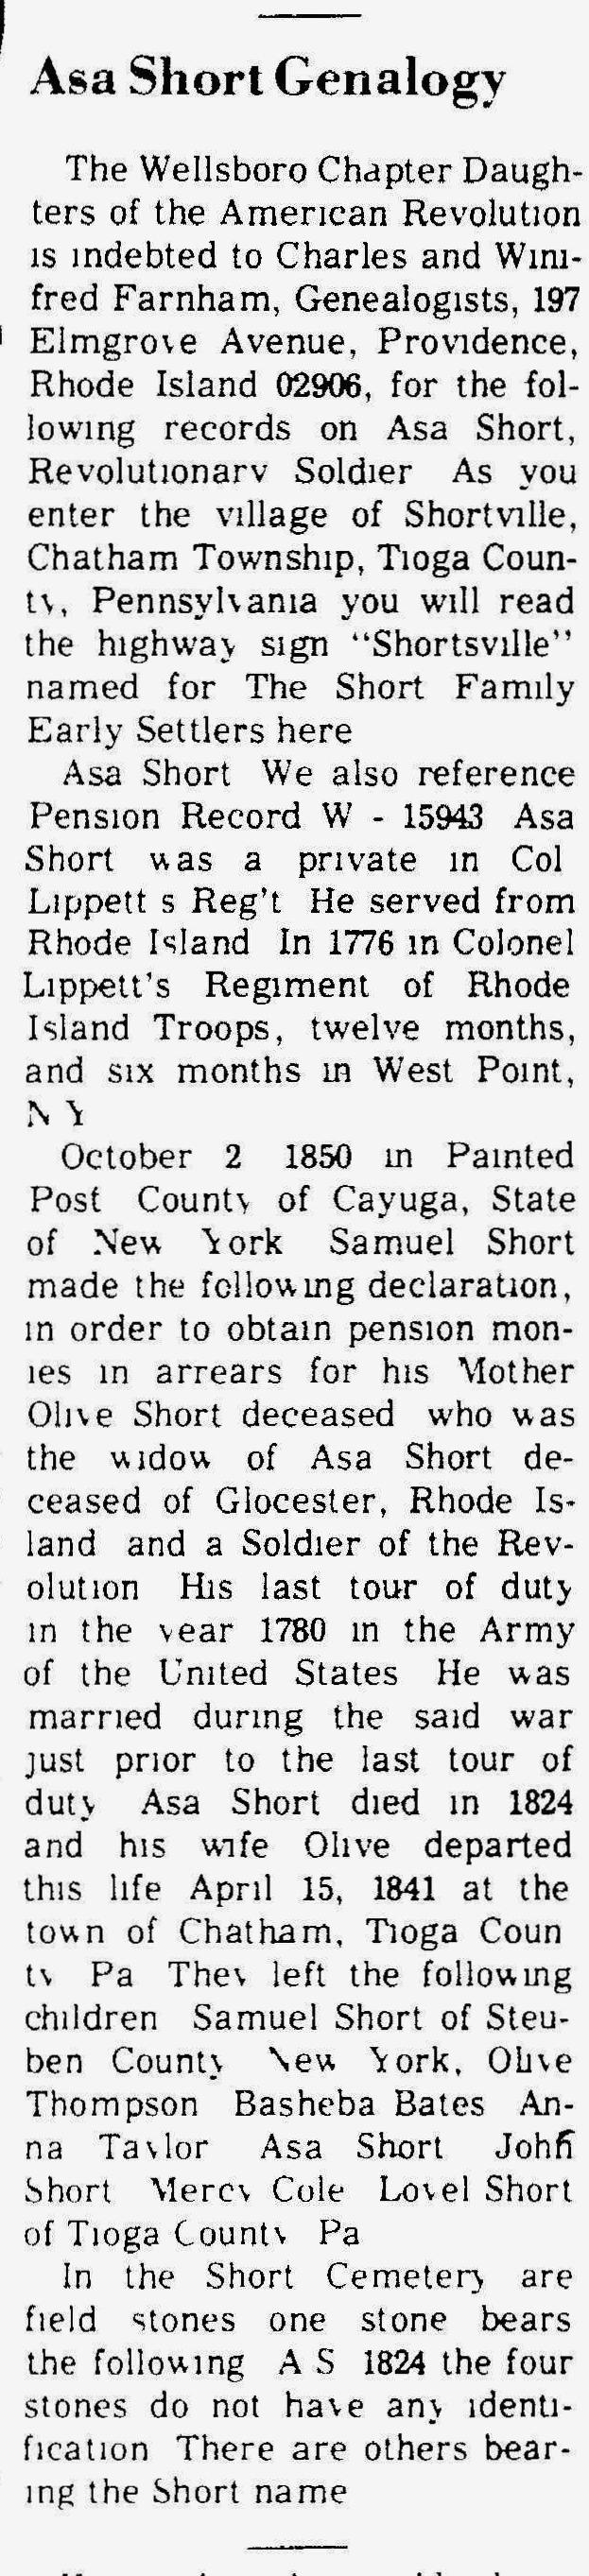 June 14, 1973 Asa Short Genalogy - The Wellsboro Gazette (Wellsboro, Pennsylvania)